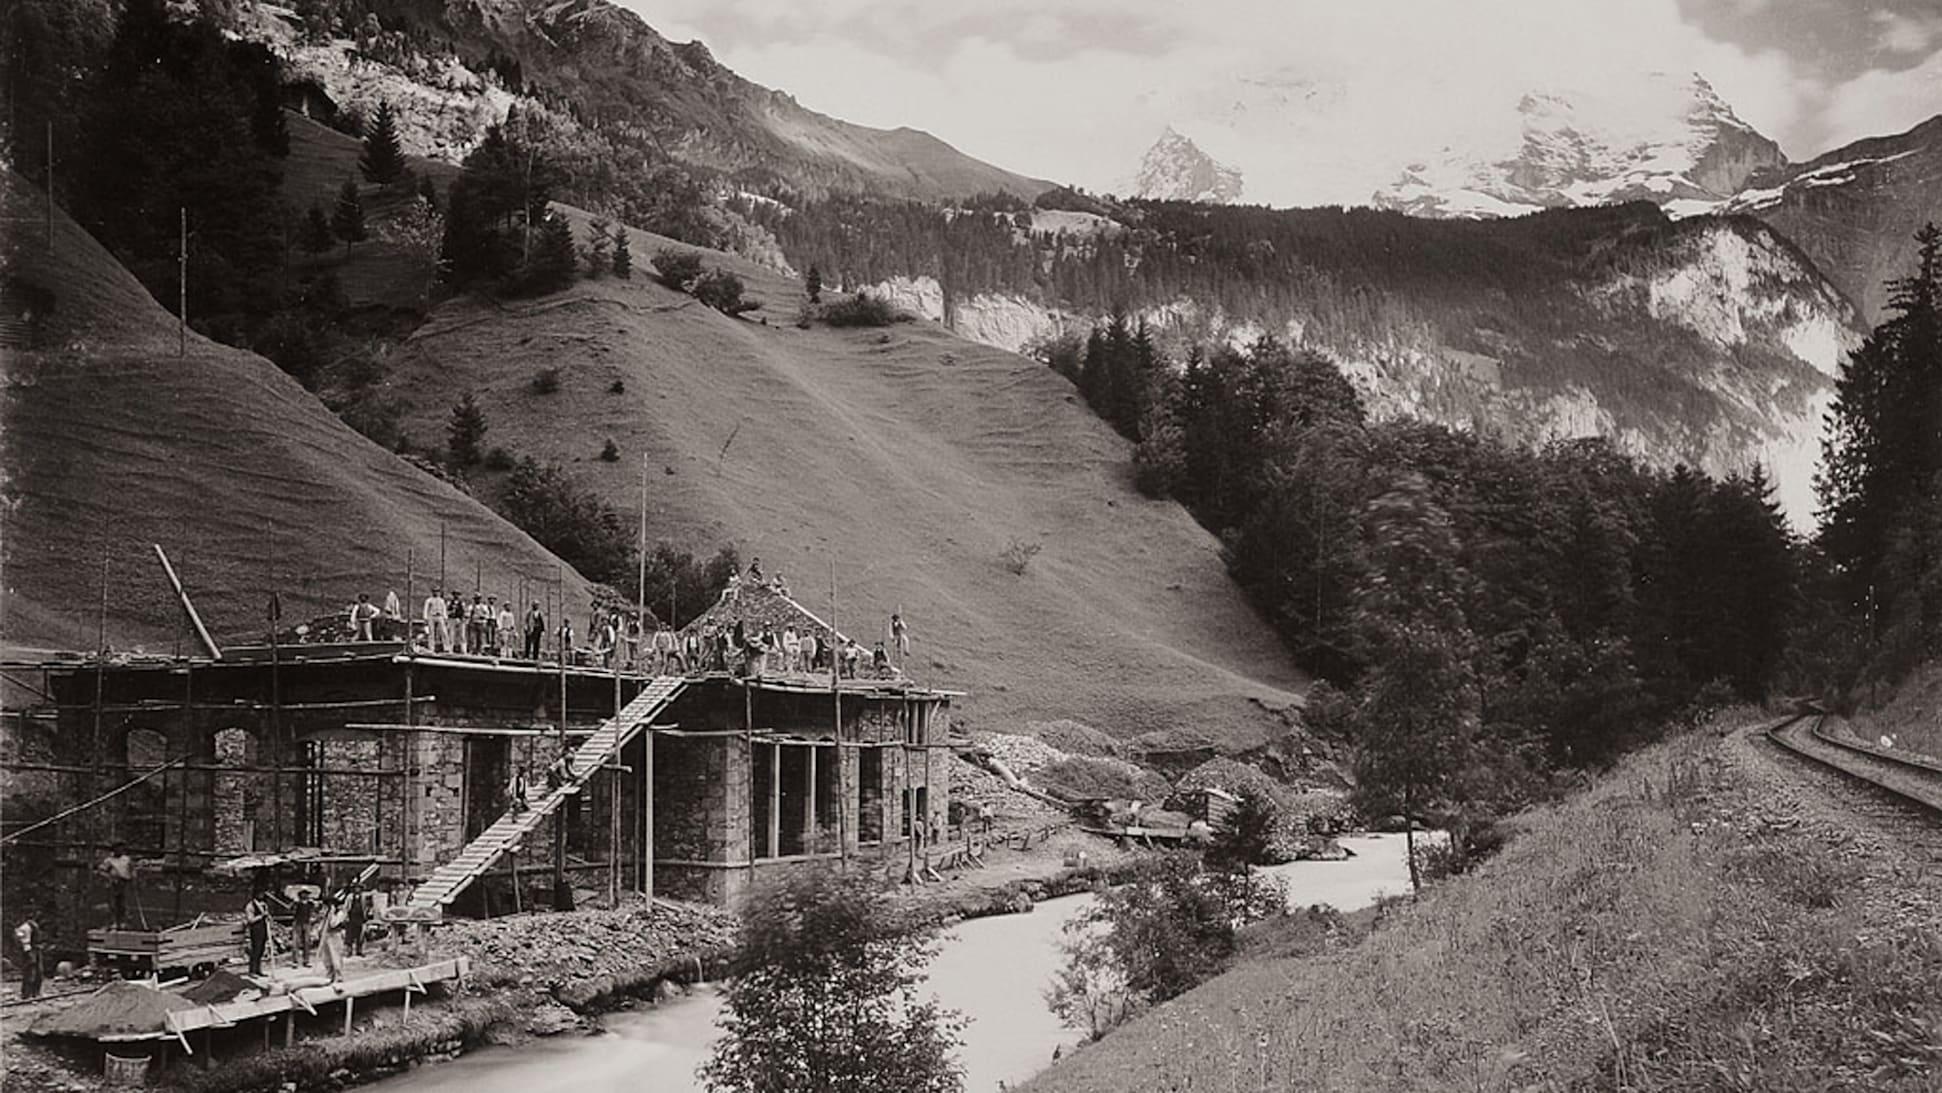 Bau der Jungfraubahn12